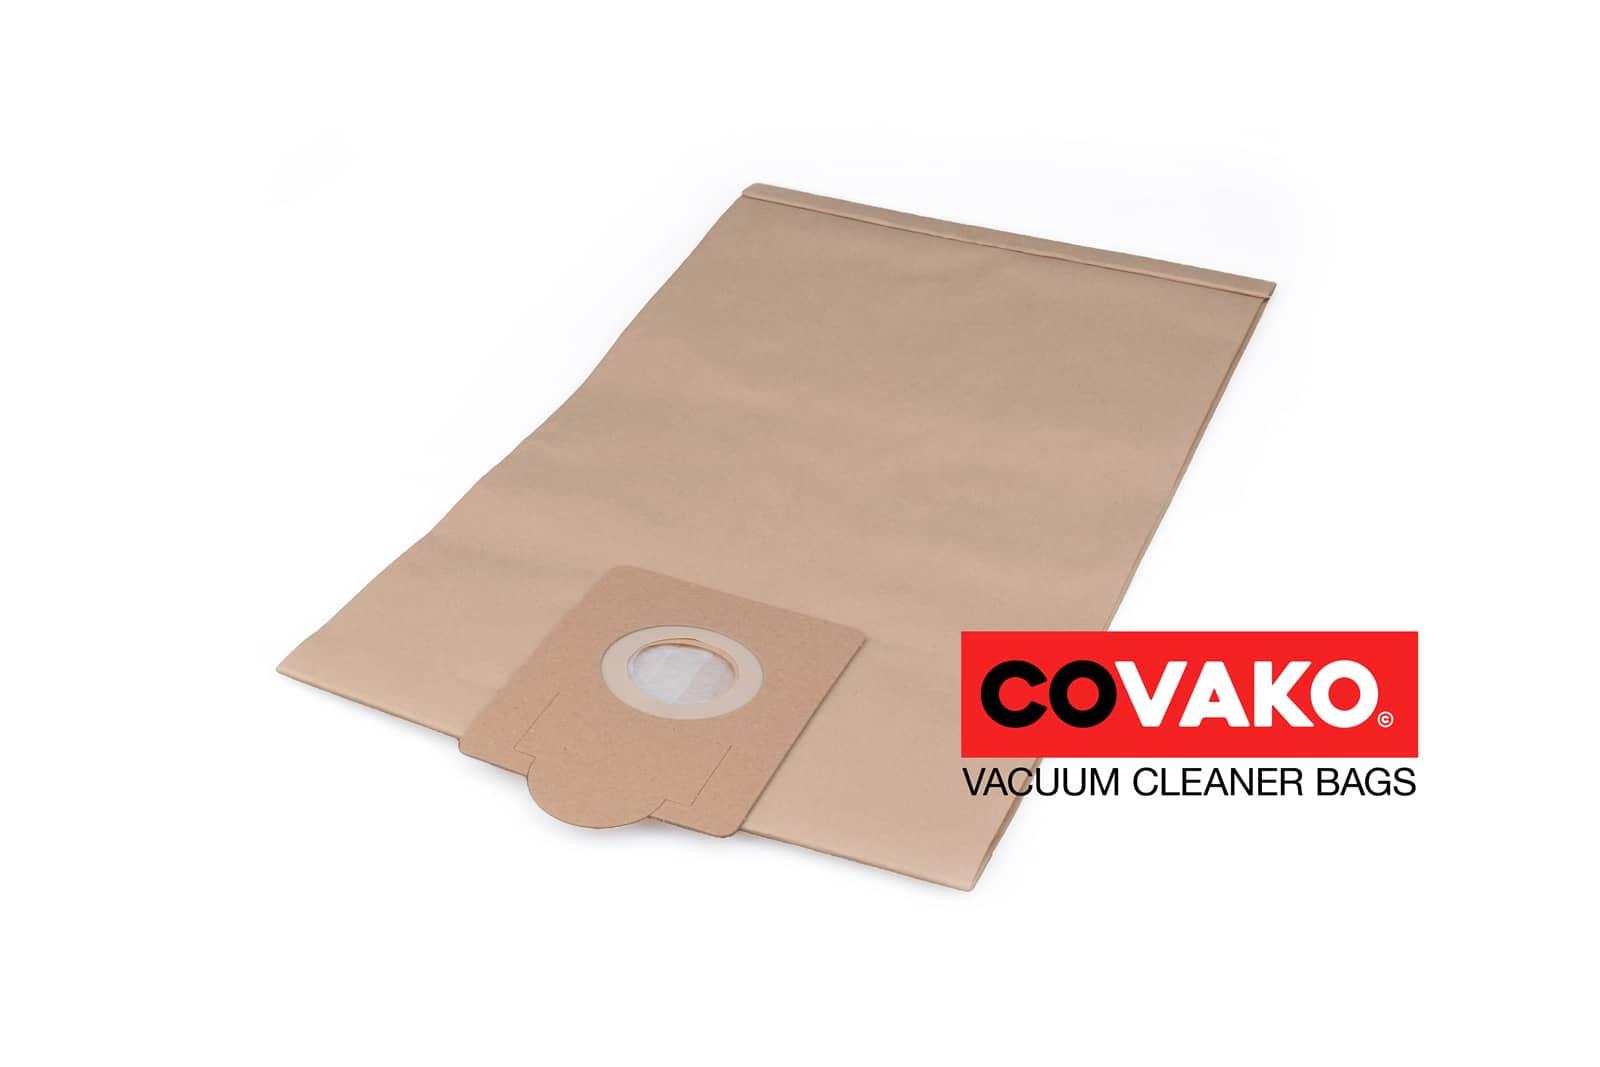 Borema TS 8 / Papier - Borema sacs d'aspirateur